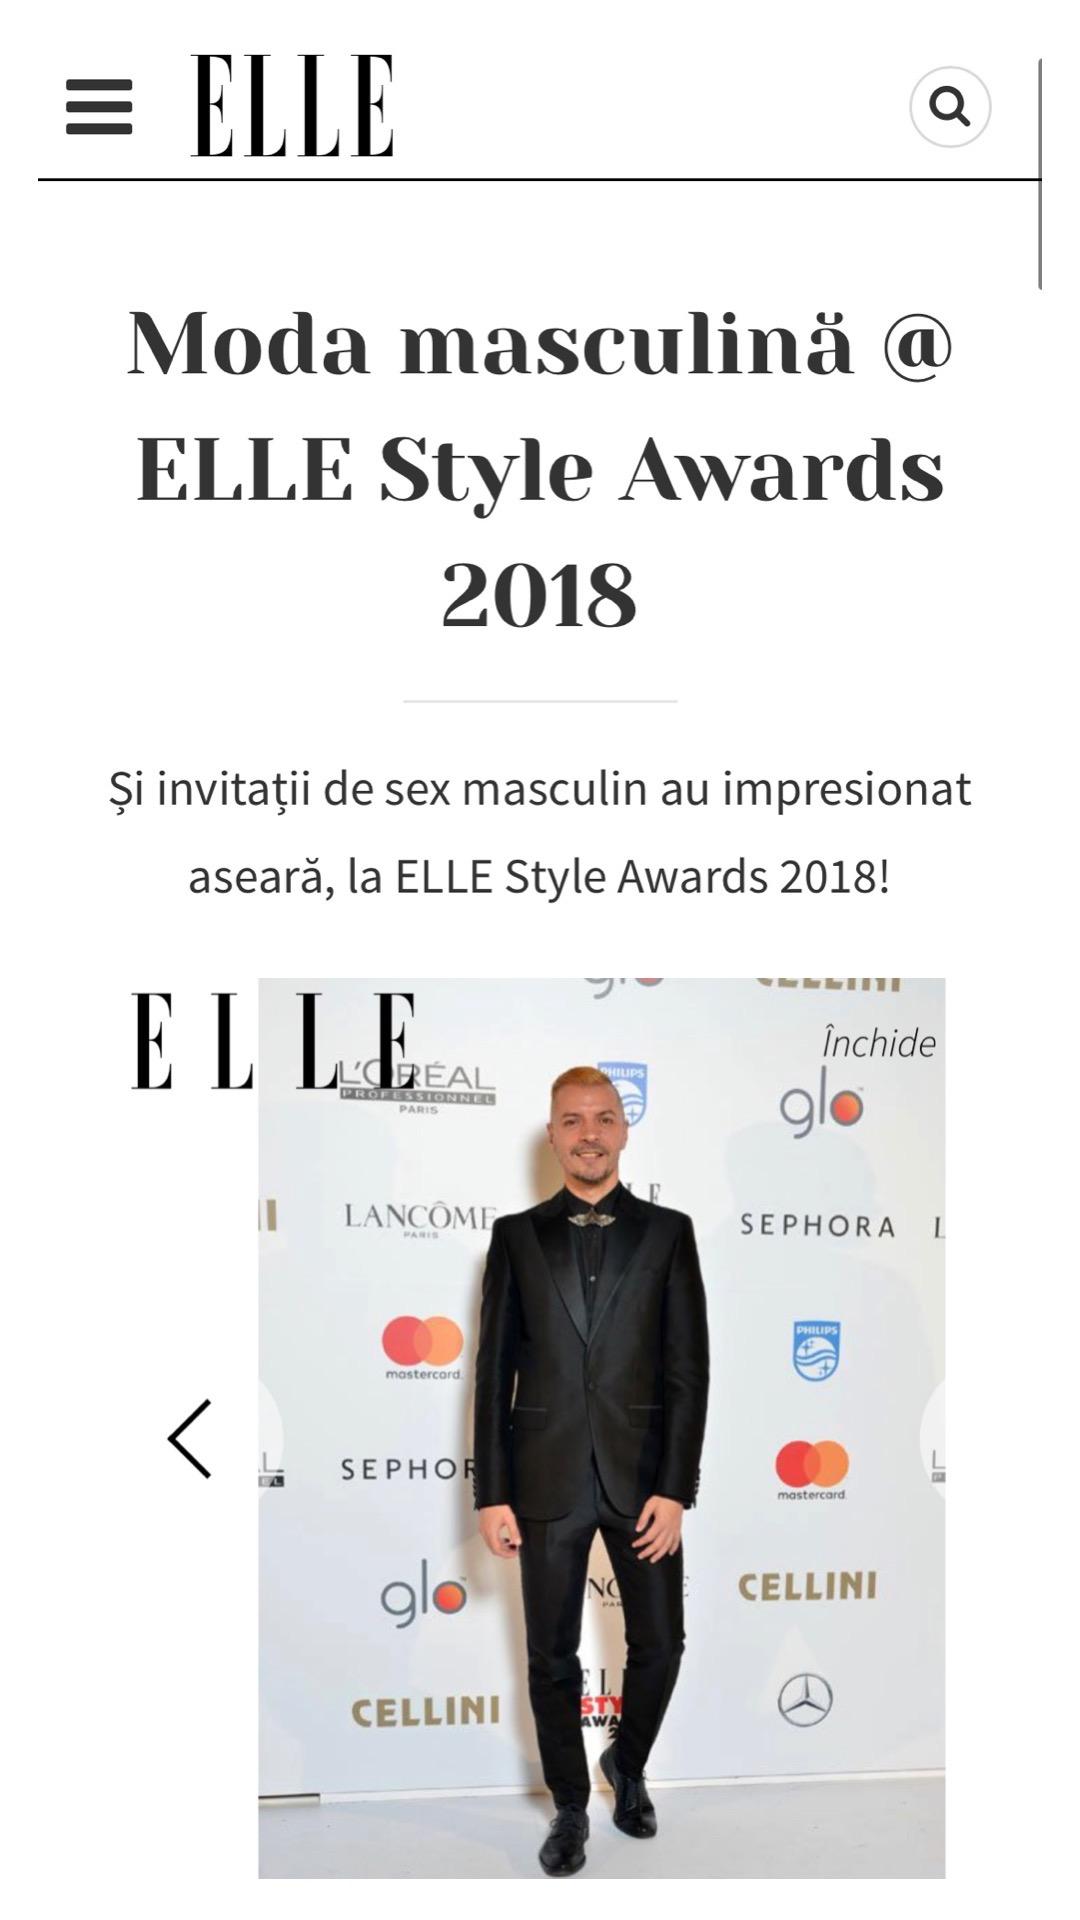 Ovidiu Muresanu Elle StyleAwards 2018